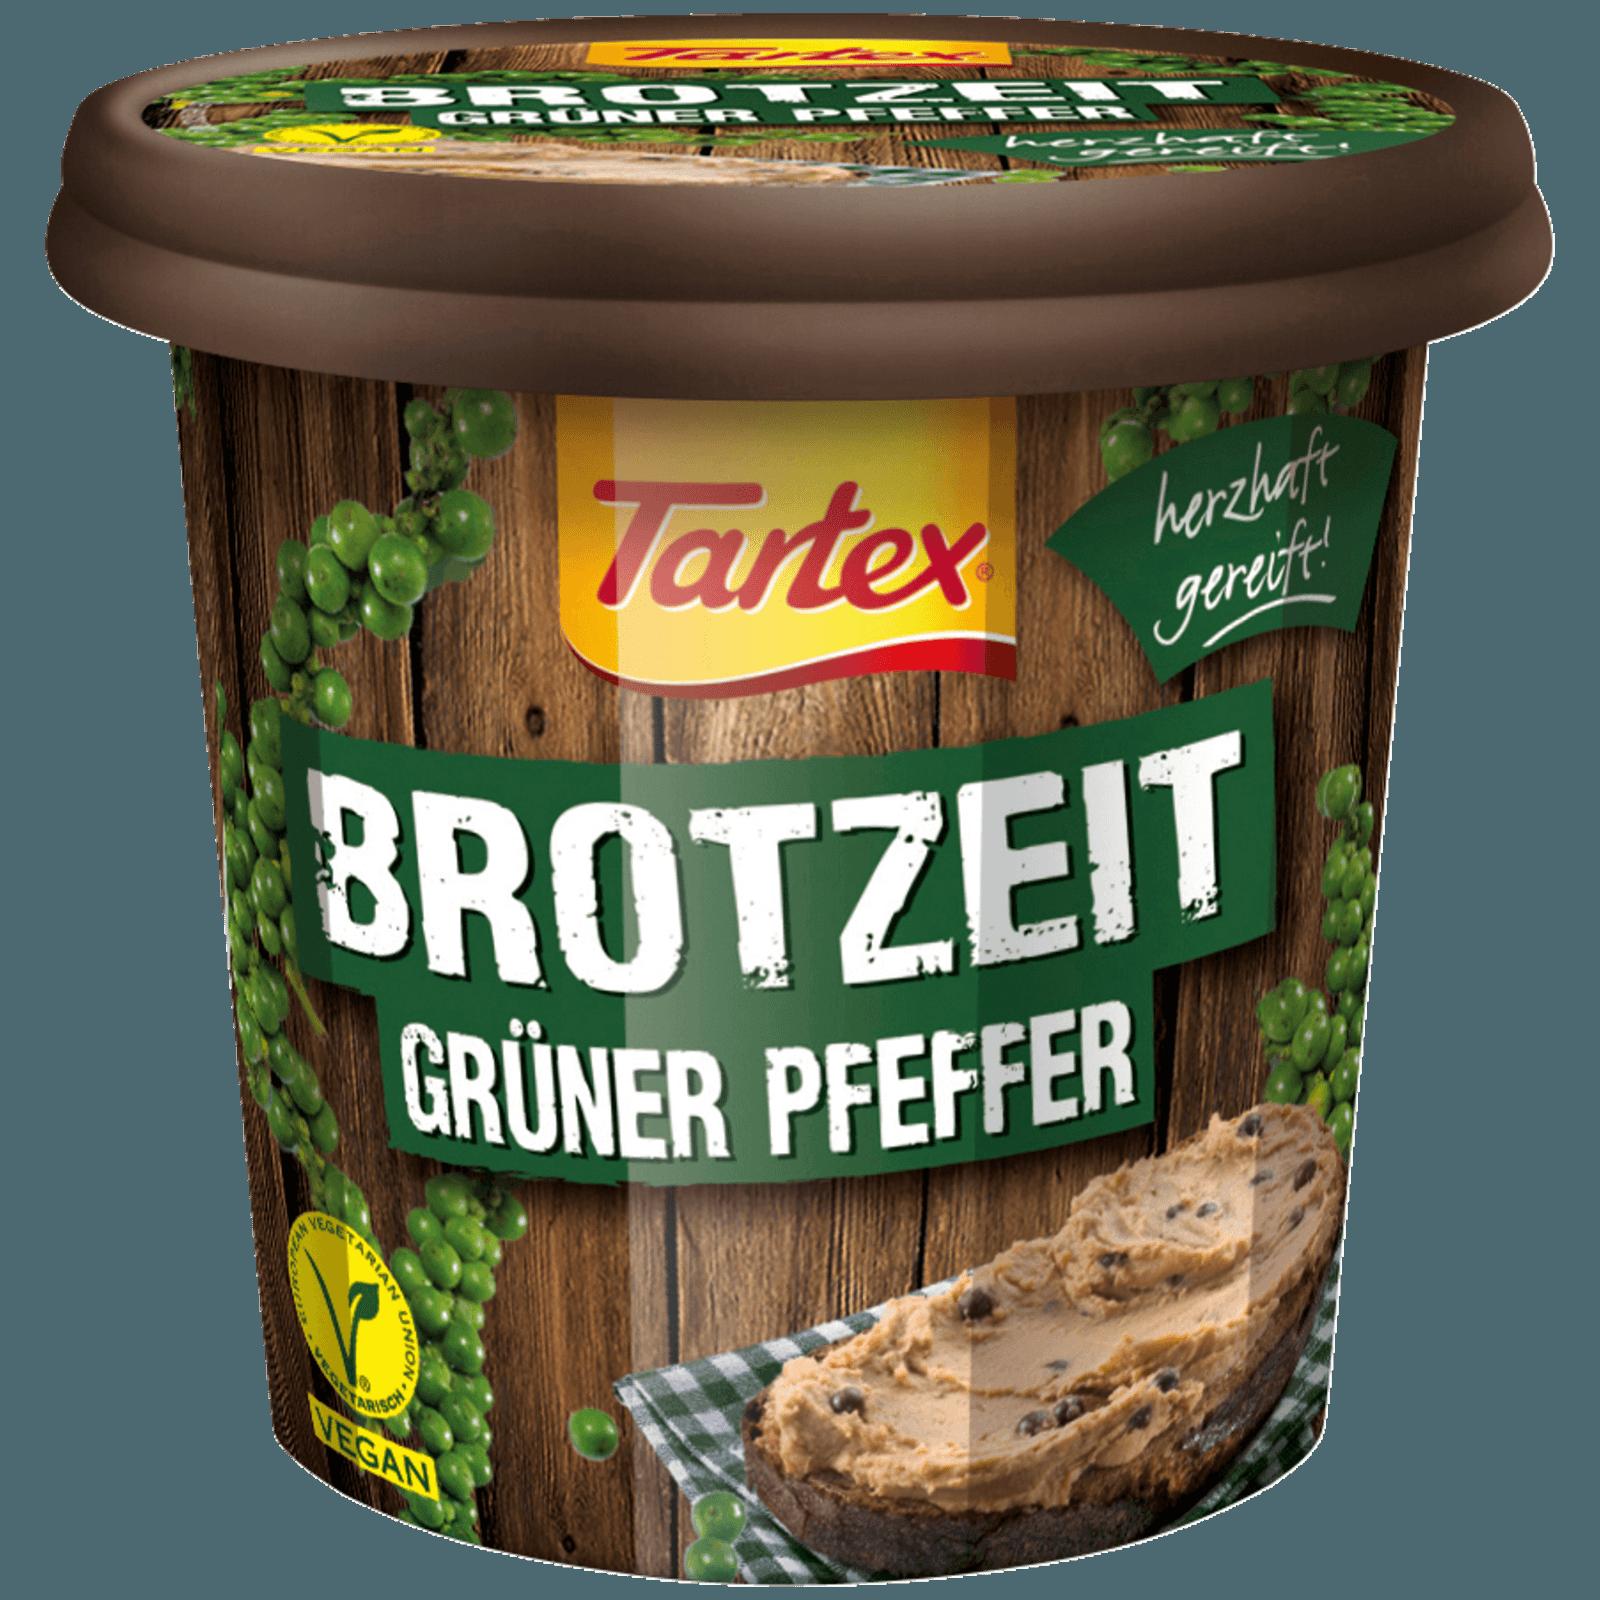 Tartex Brotzeit grüner Pfeffer 125g